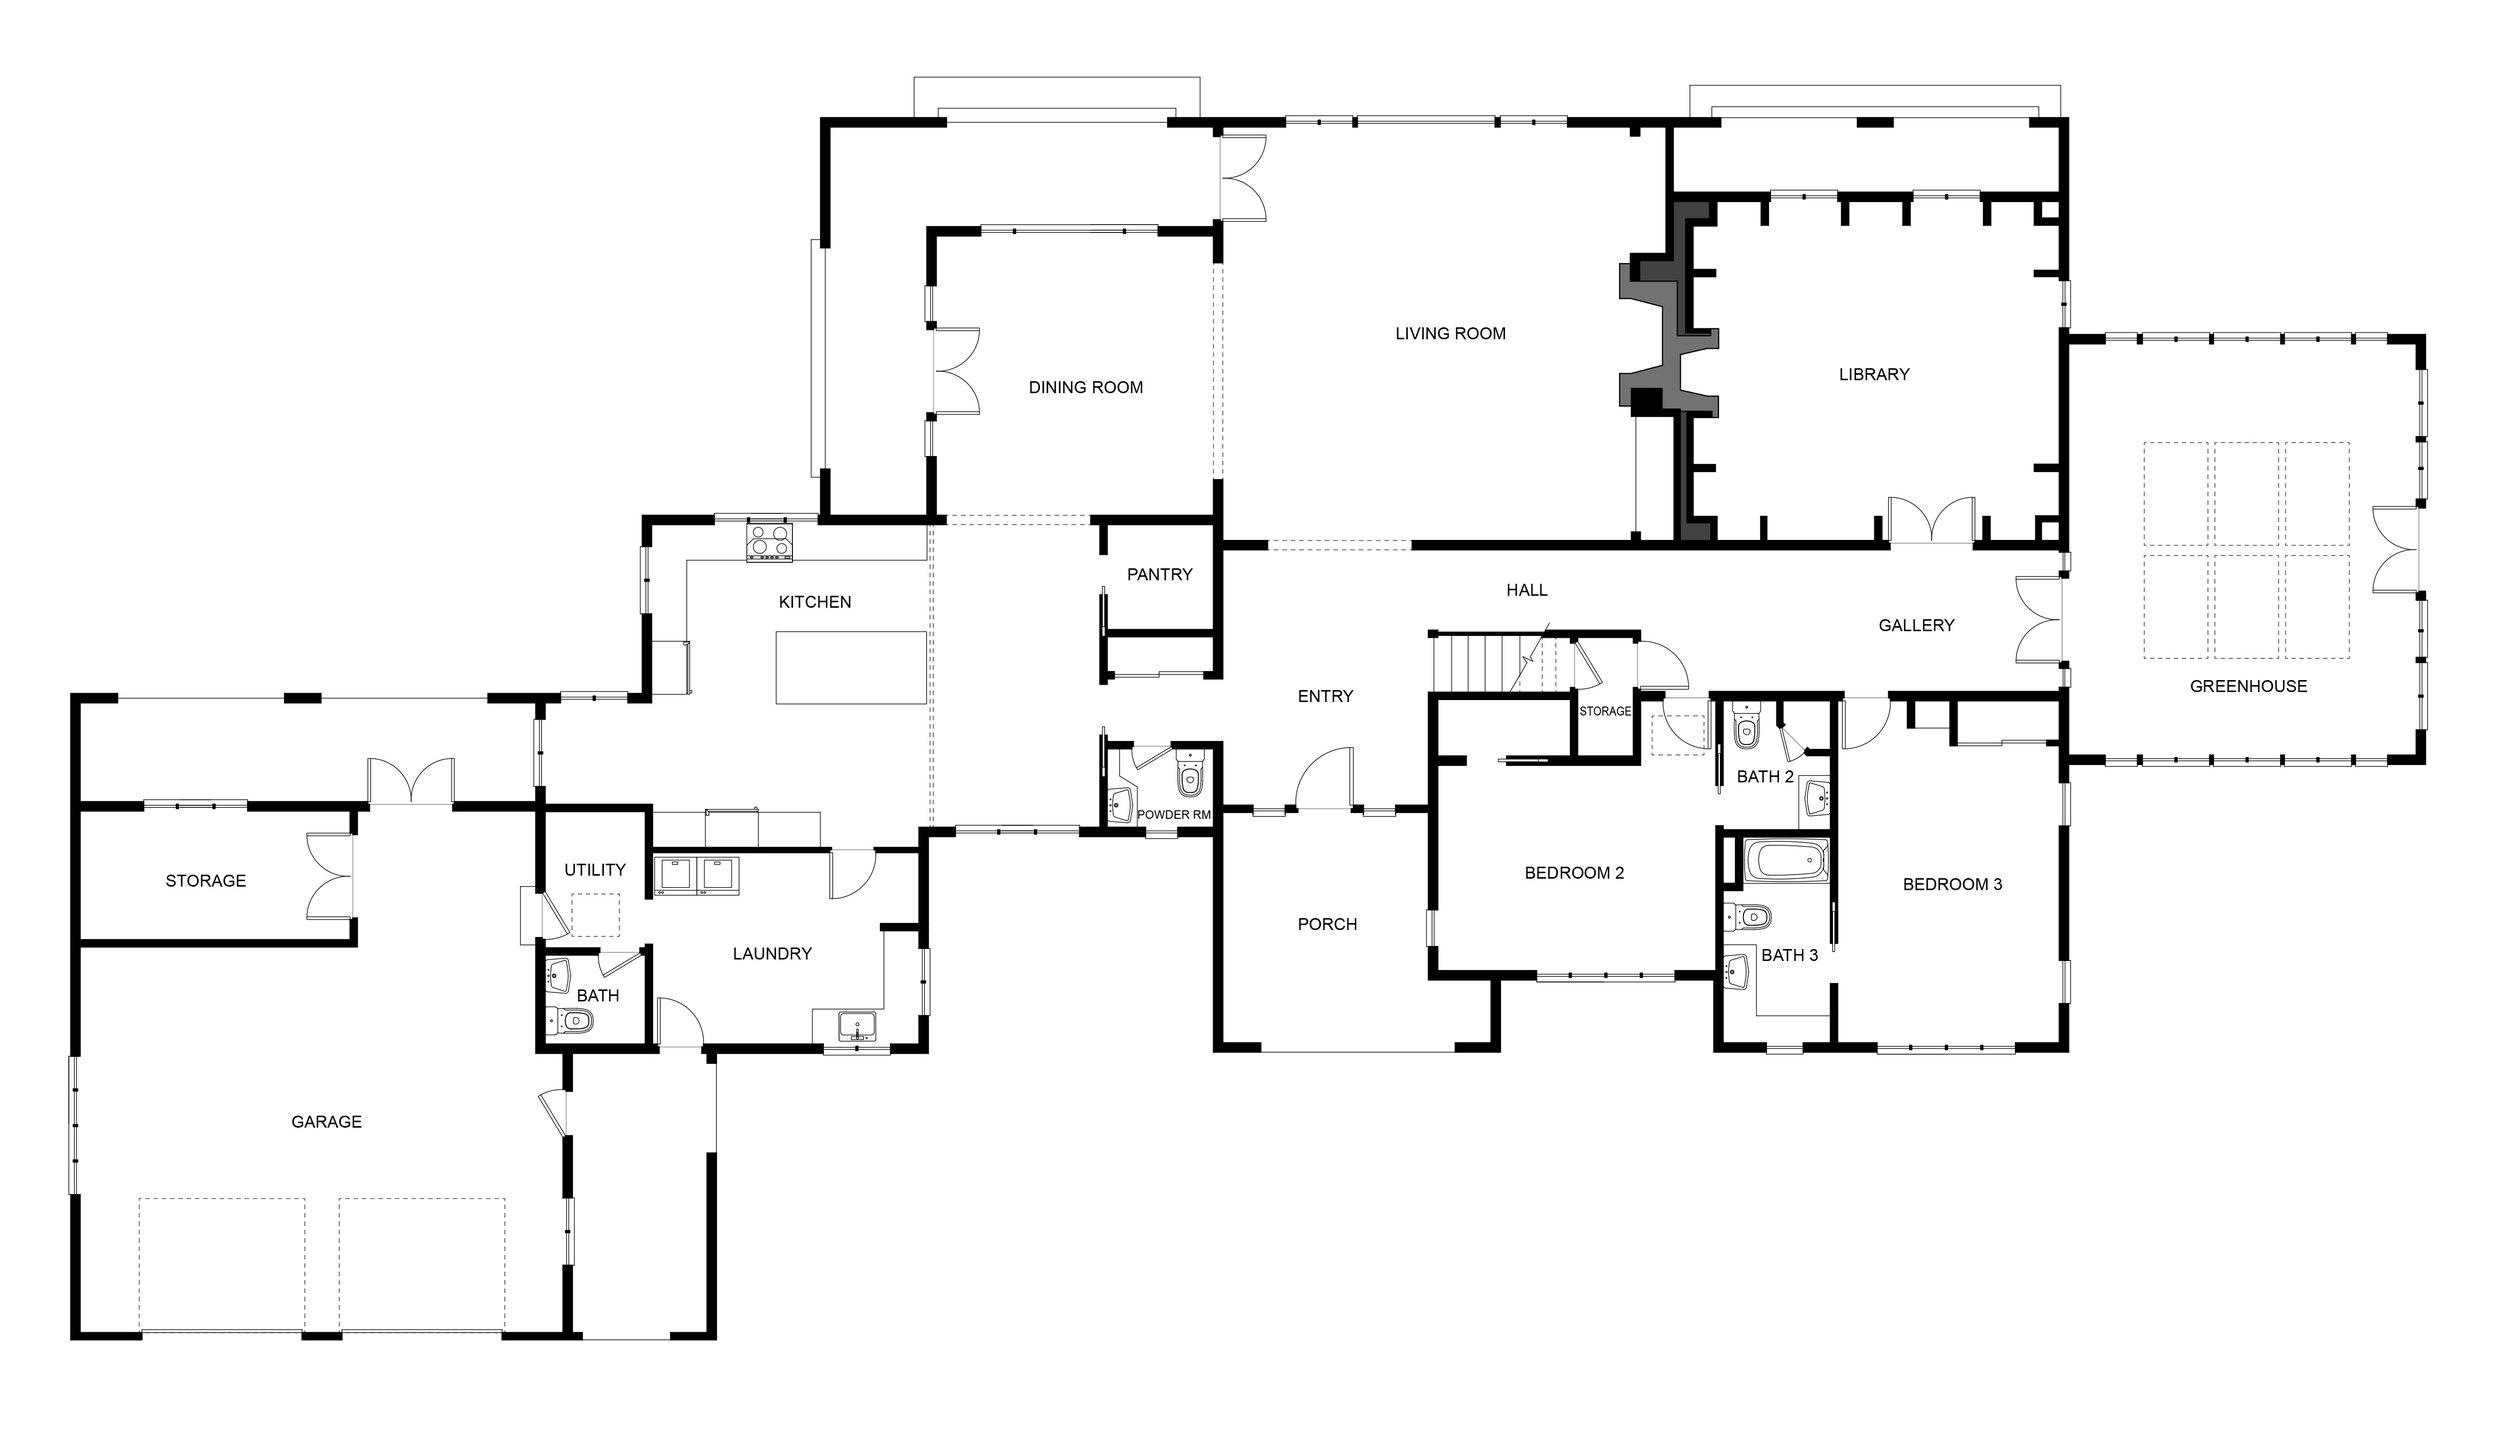 Main House Floor Plan  - Level 1